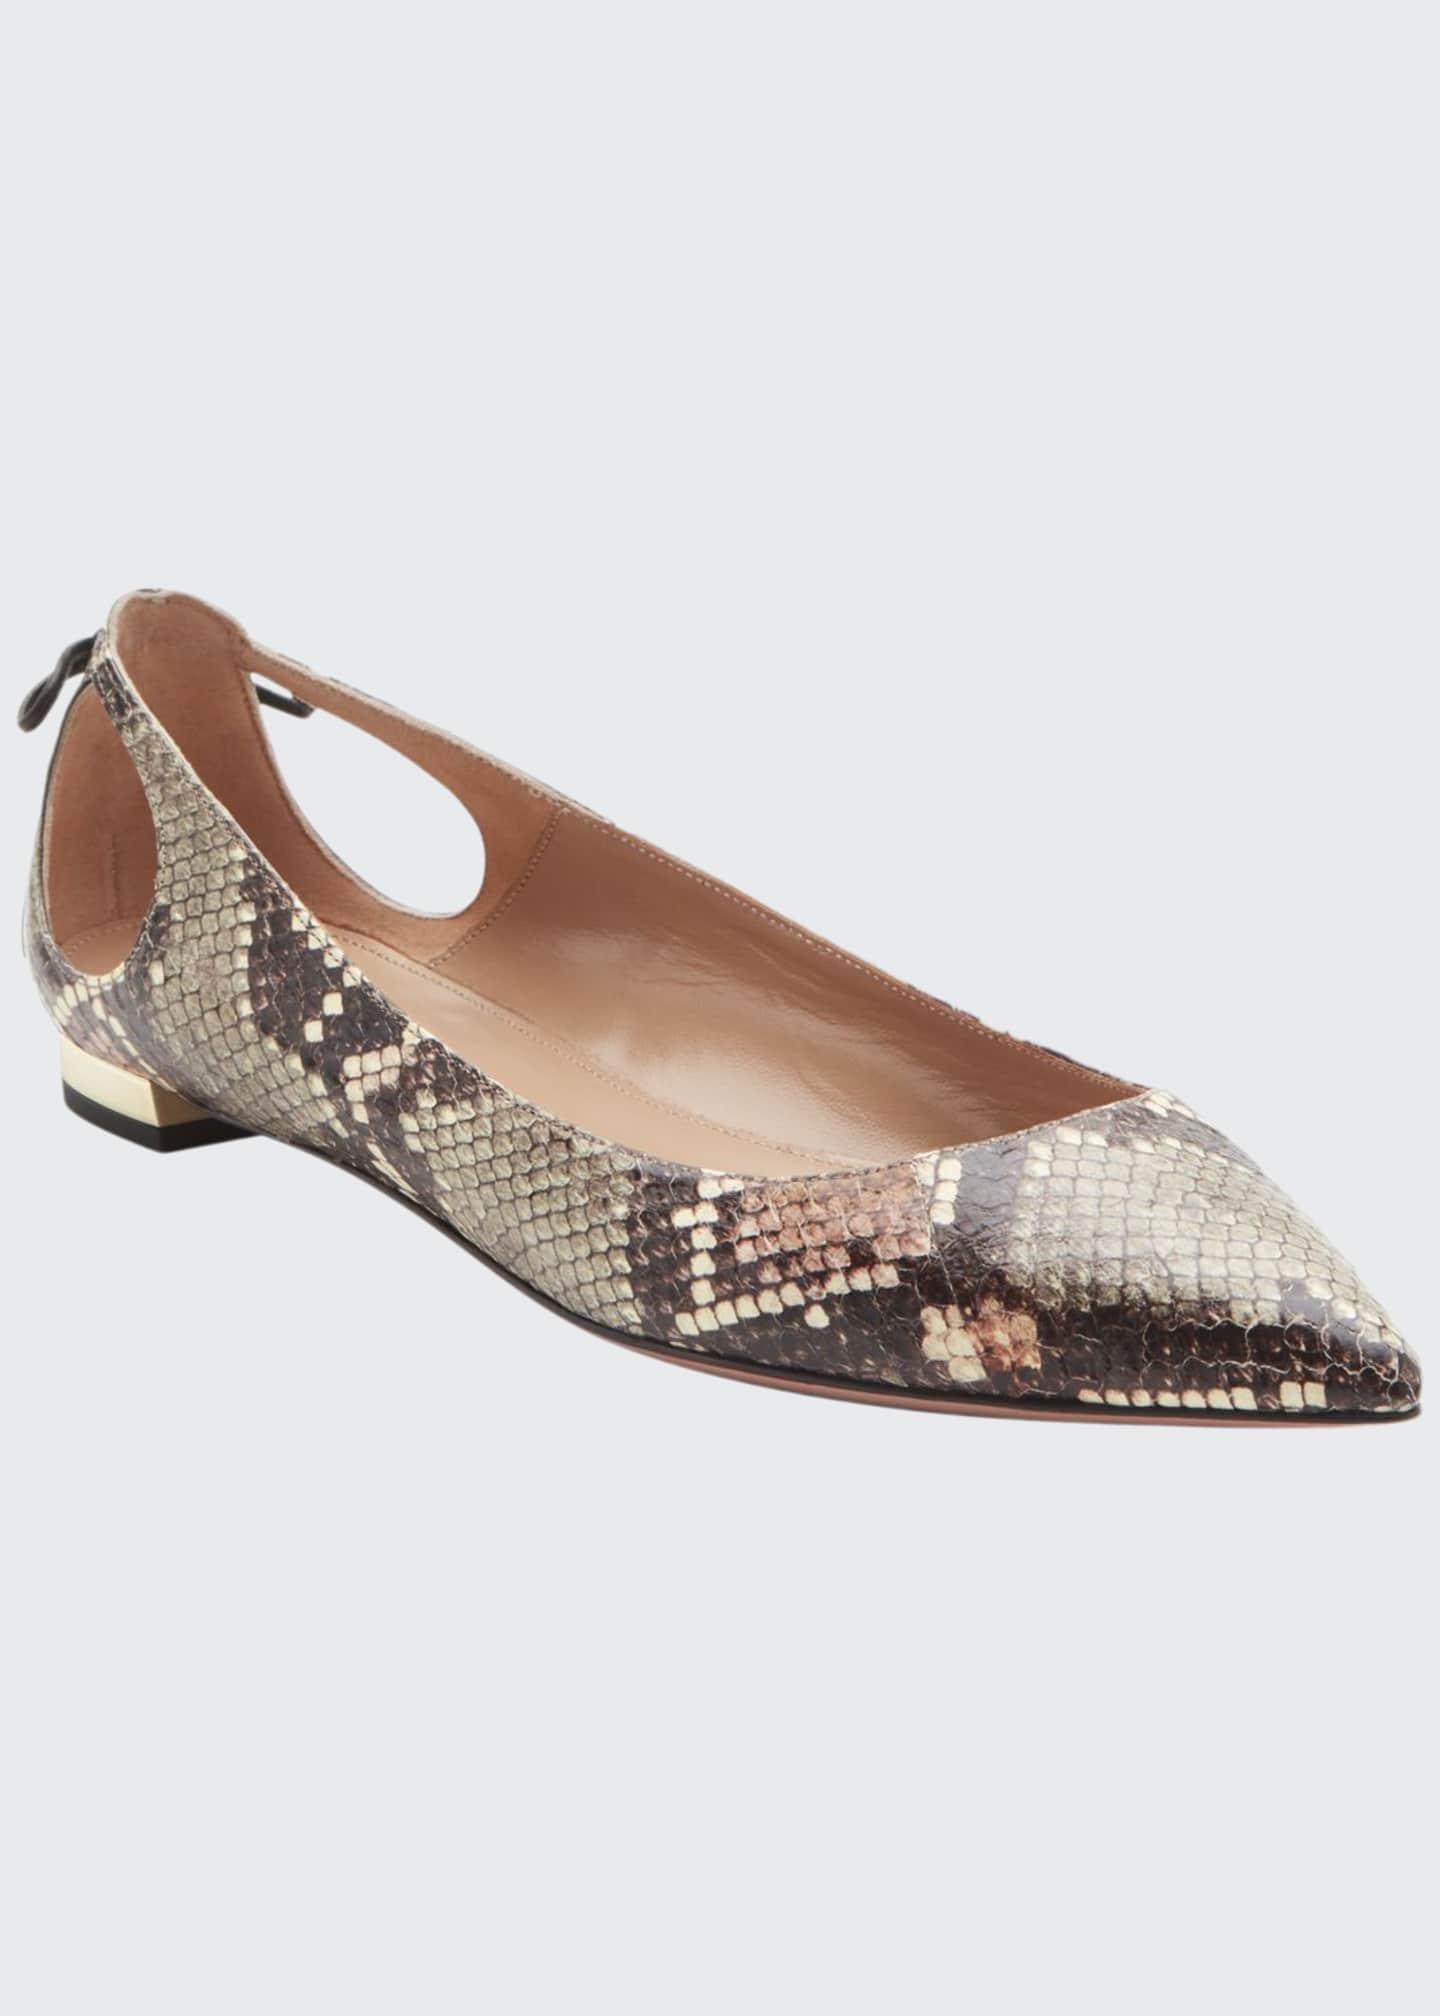 Aquazzura Forever Marilyn Snakeskin Ballet Flats